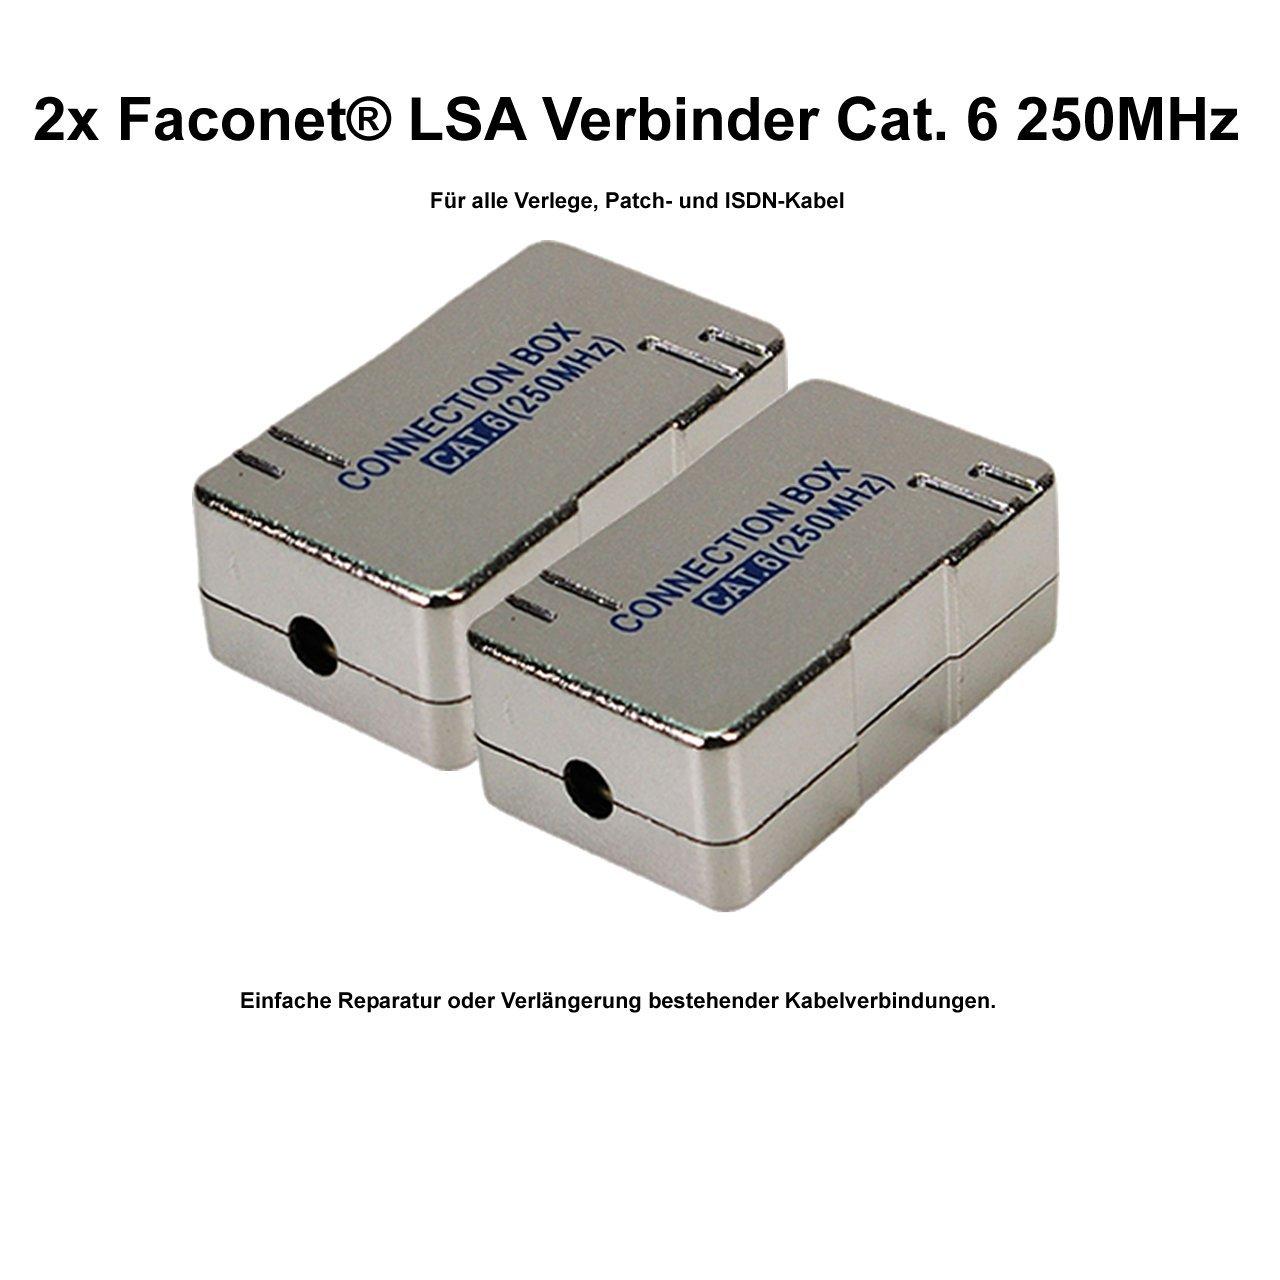 2x Faconet® LSA Verbinder Cat.6 zum Verbinden: Amazon.de: Computer ...